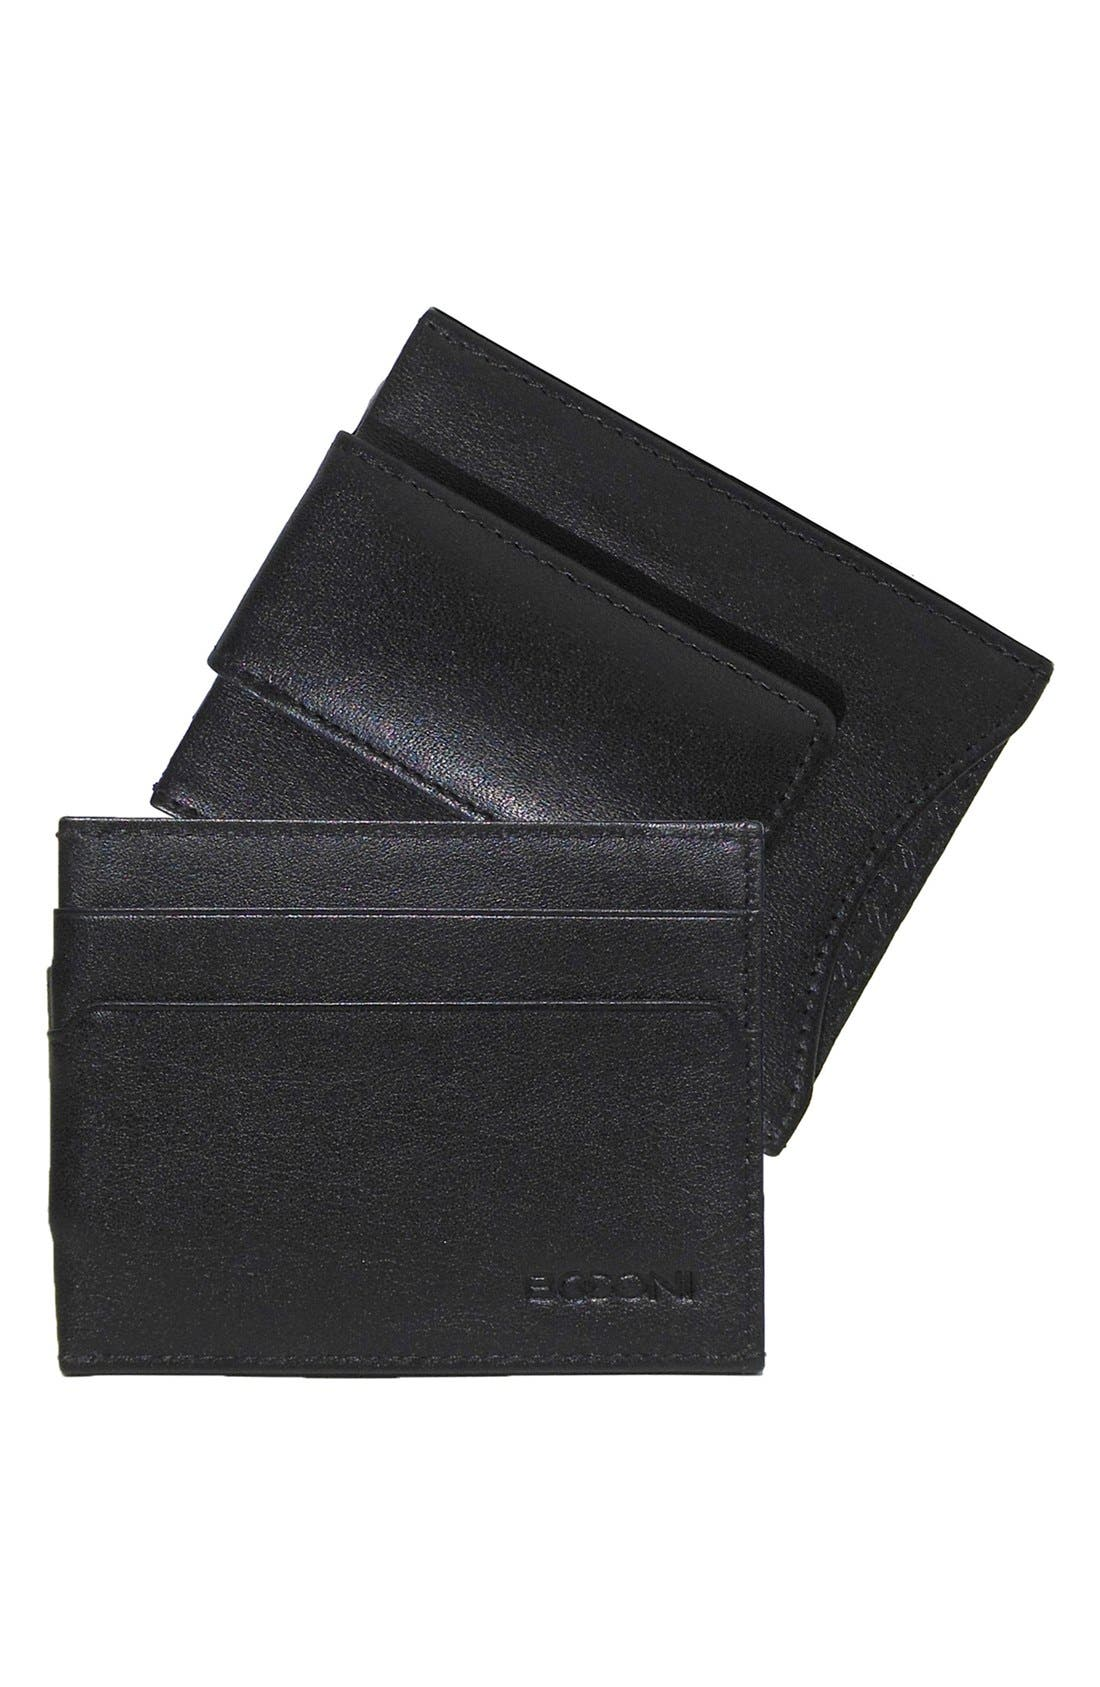 'Grant' Money Clip Card Case,                             Alternate thumbnail 3, color,                             BLACK/ GREY